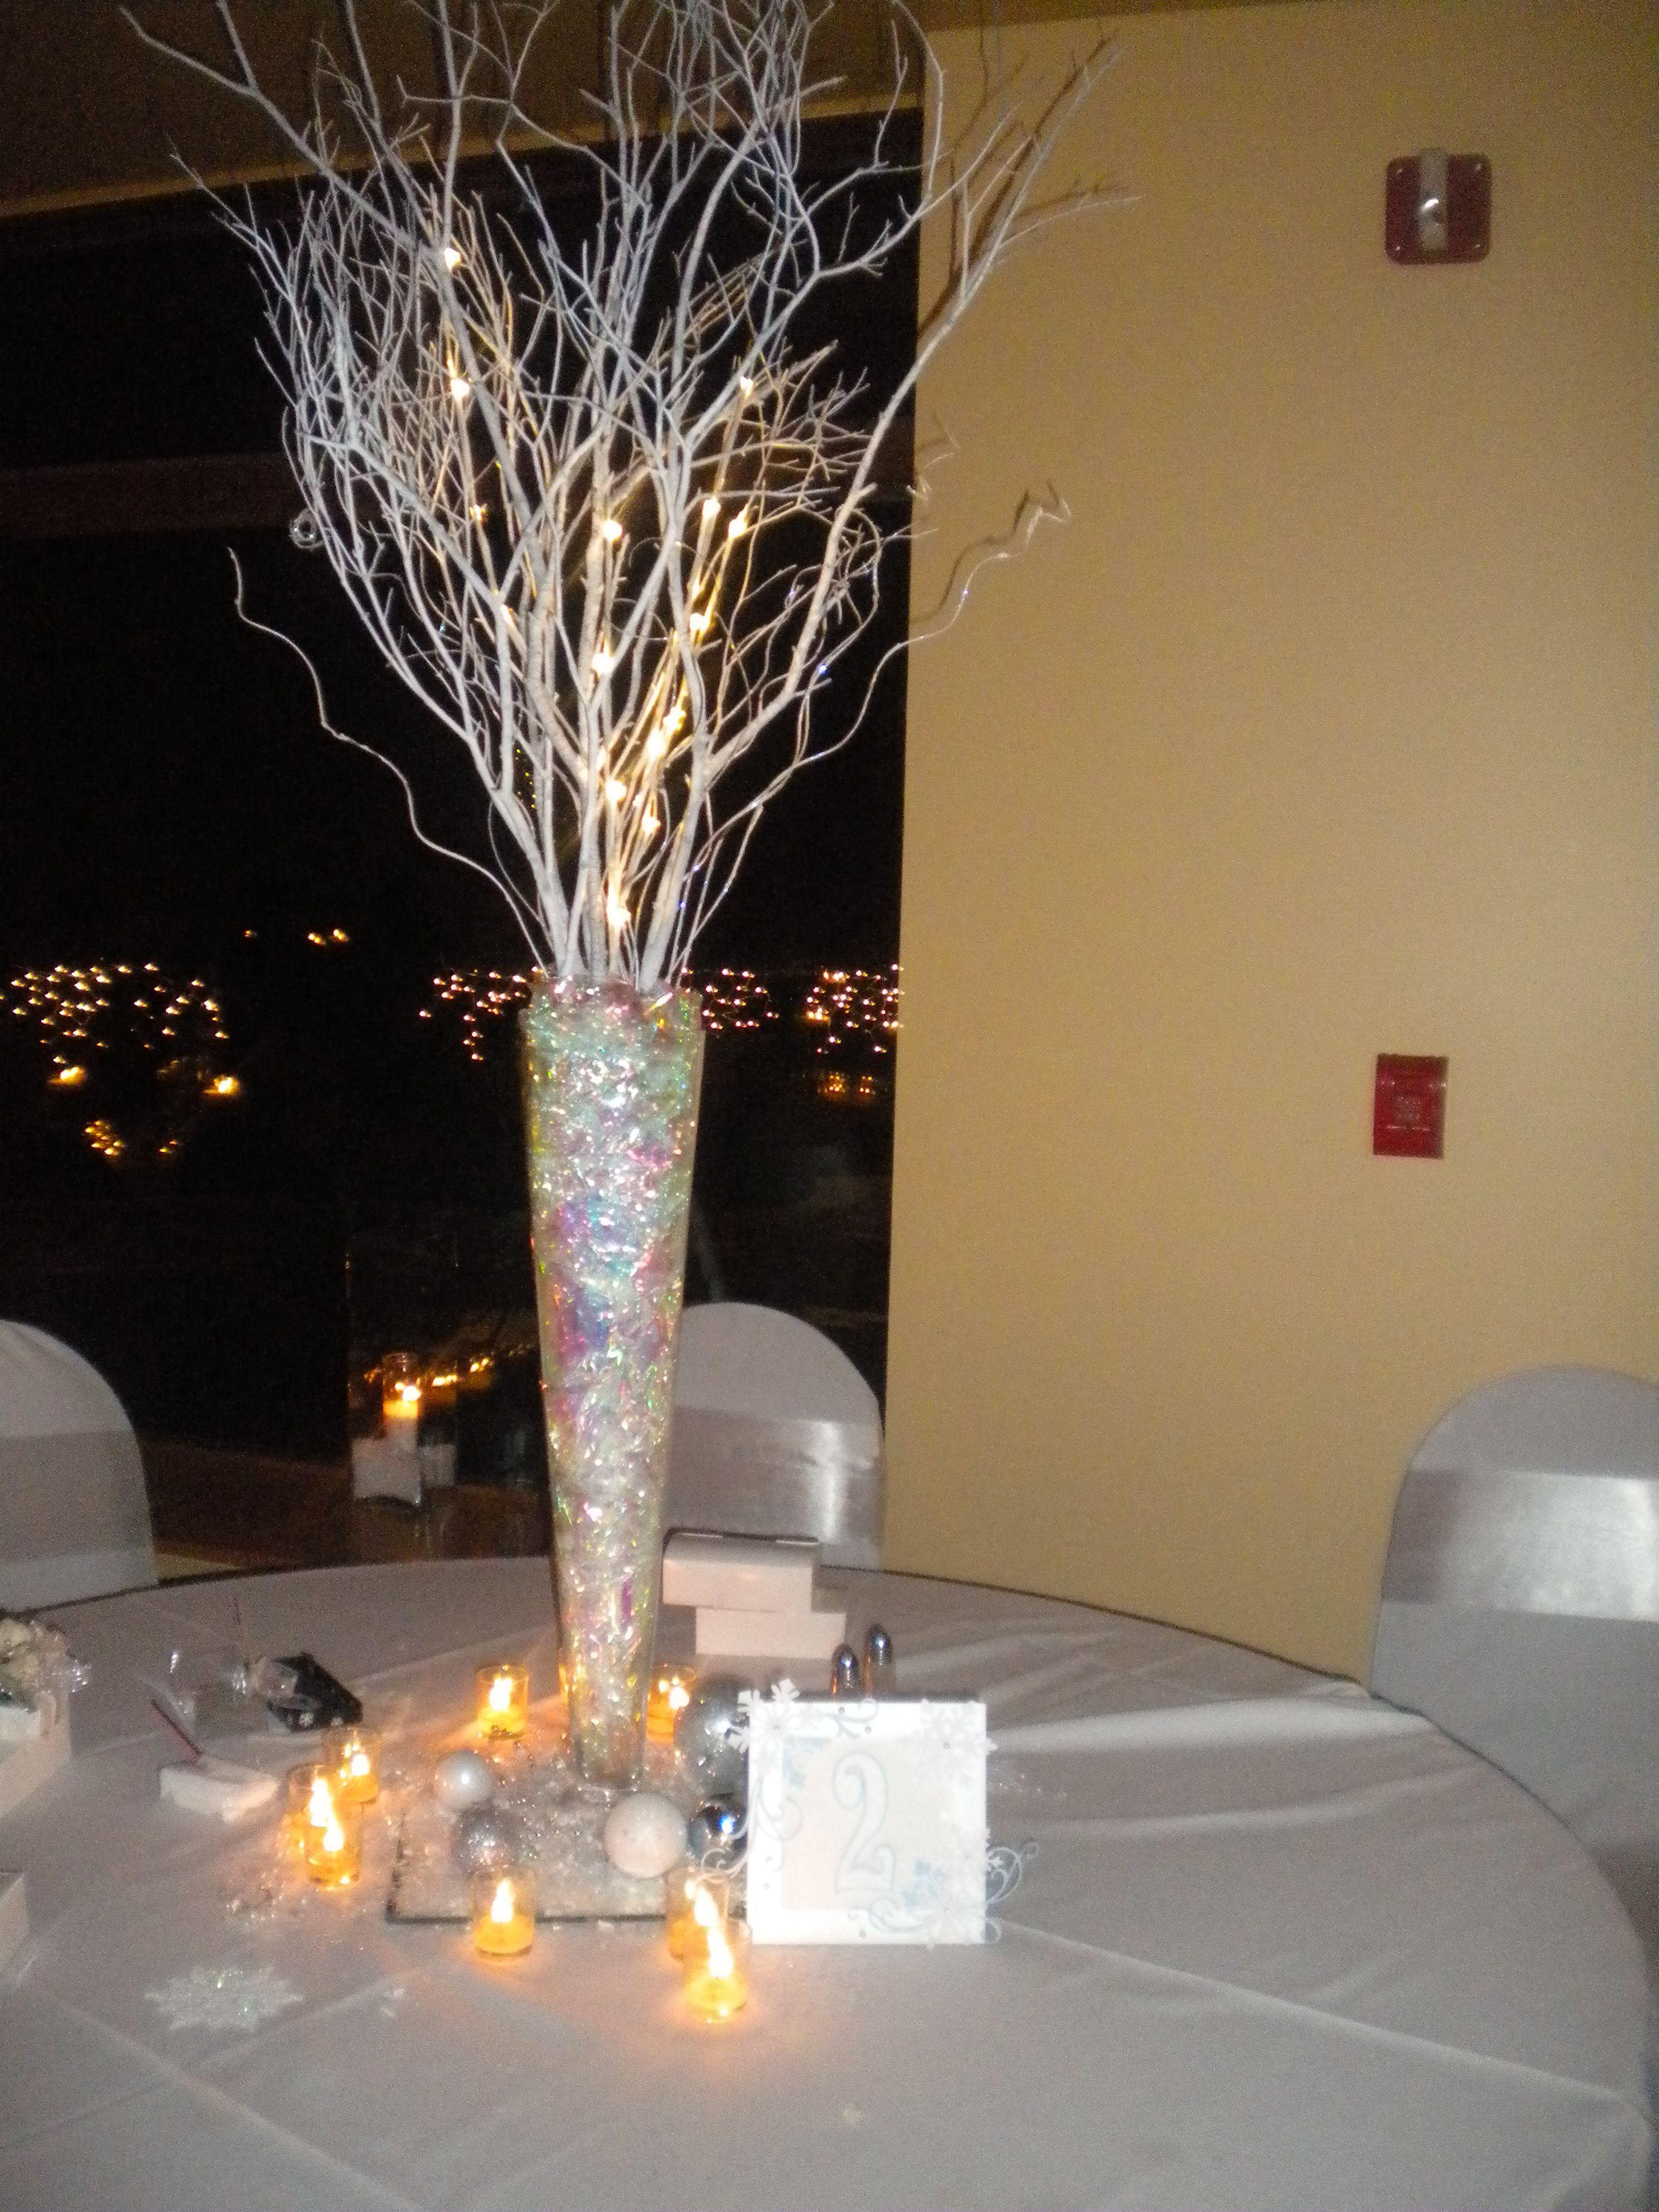 Winter Wedding Centerpiece Ideas Diy : Winter wedding centerpiece weddings